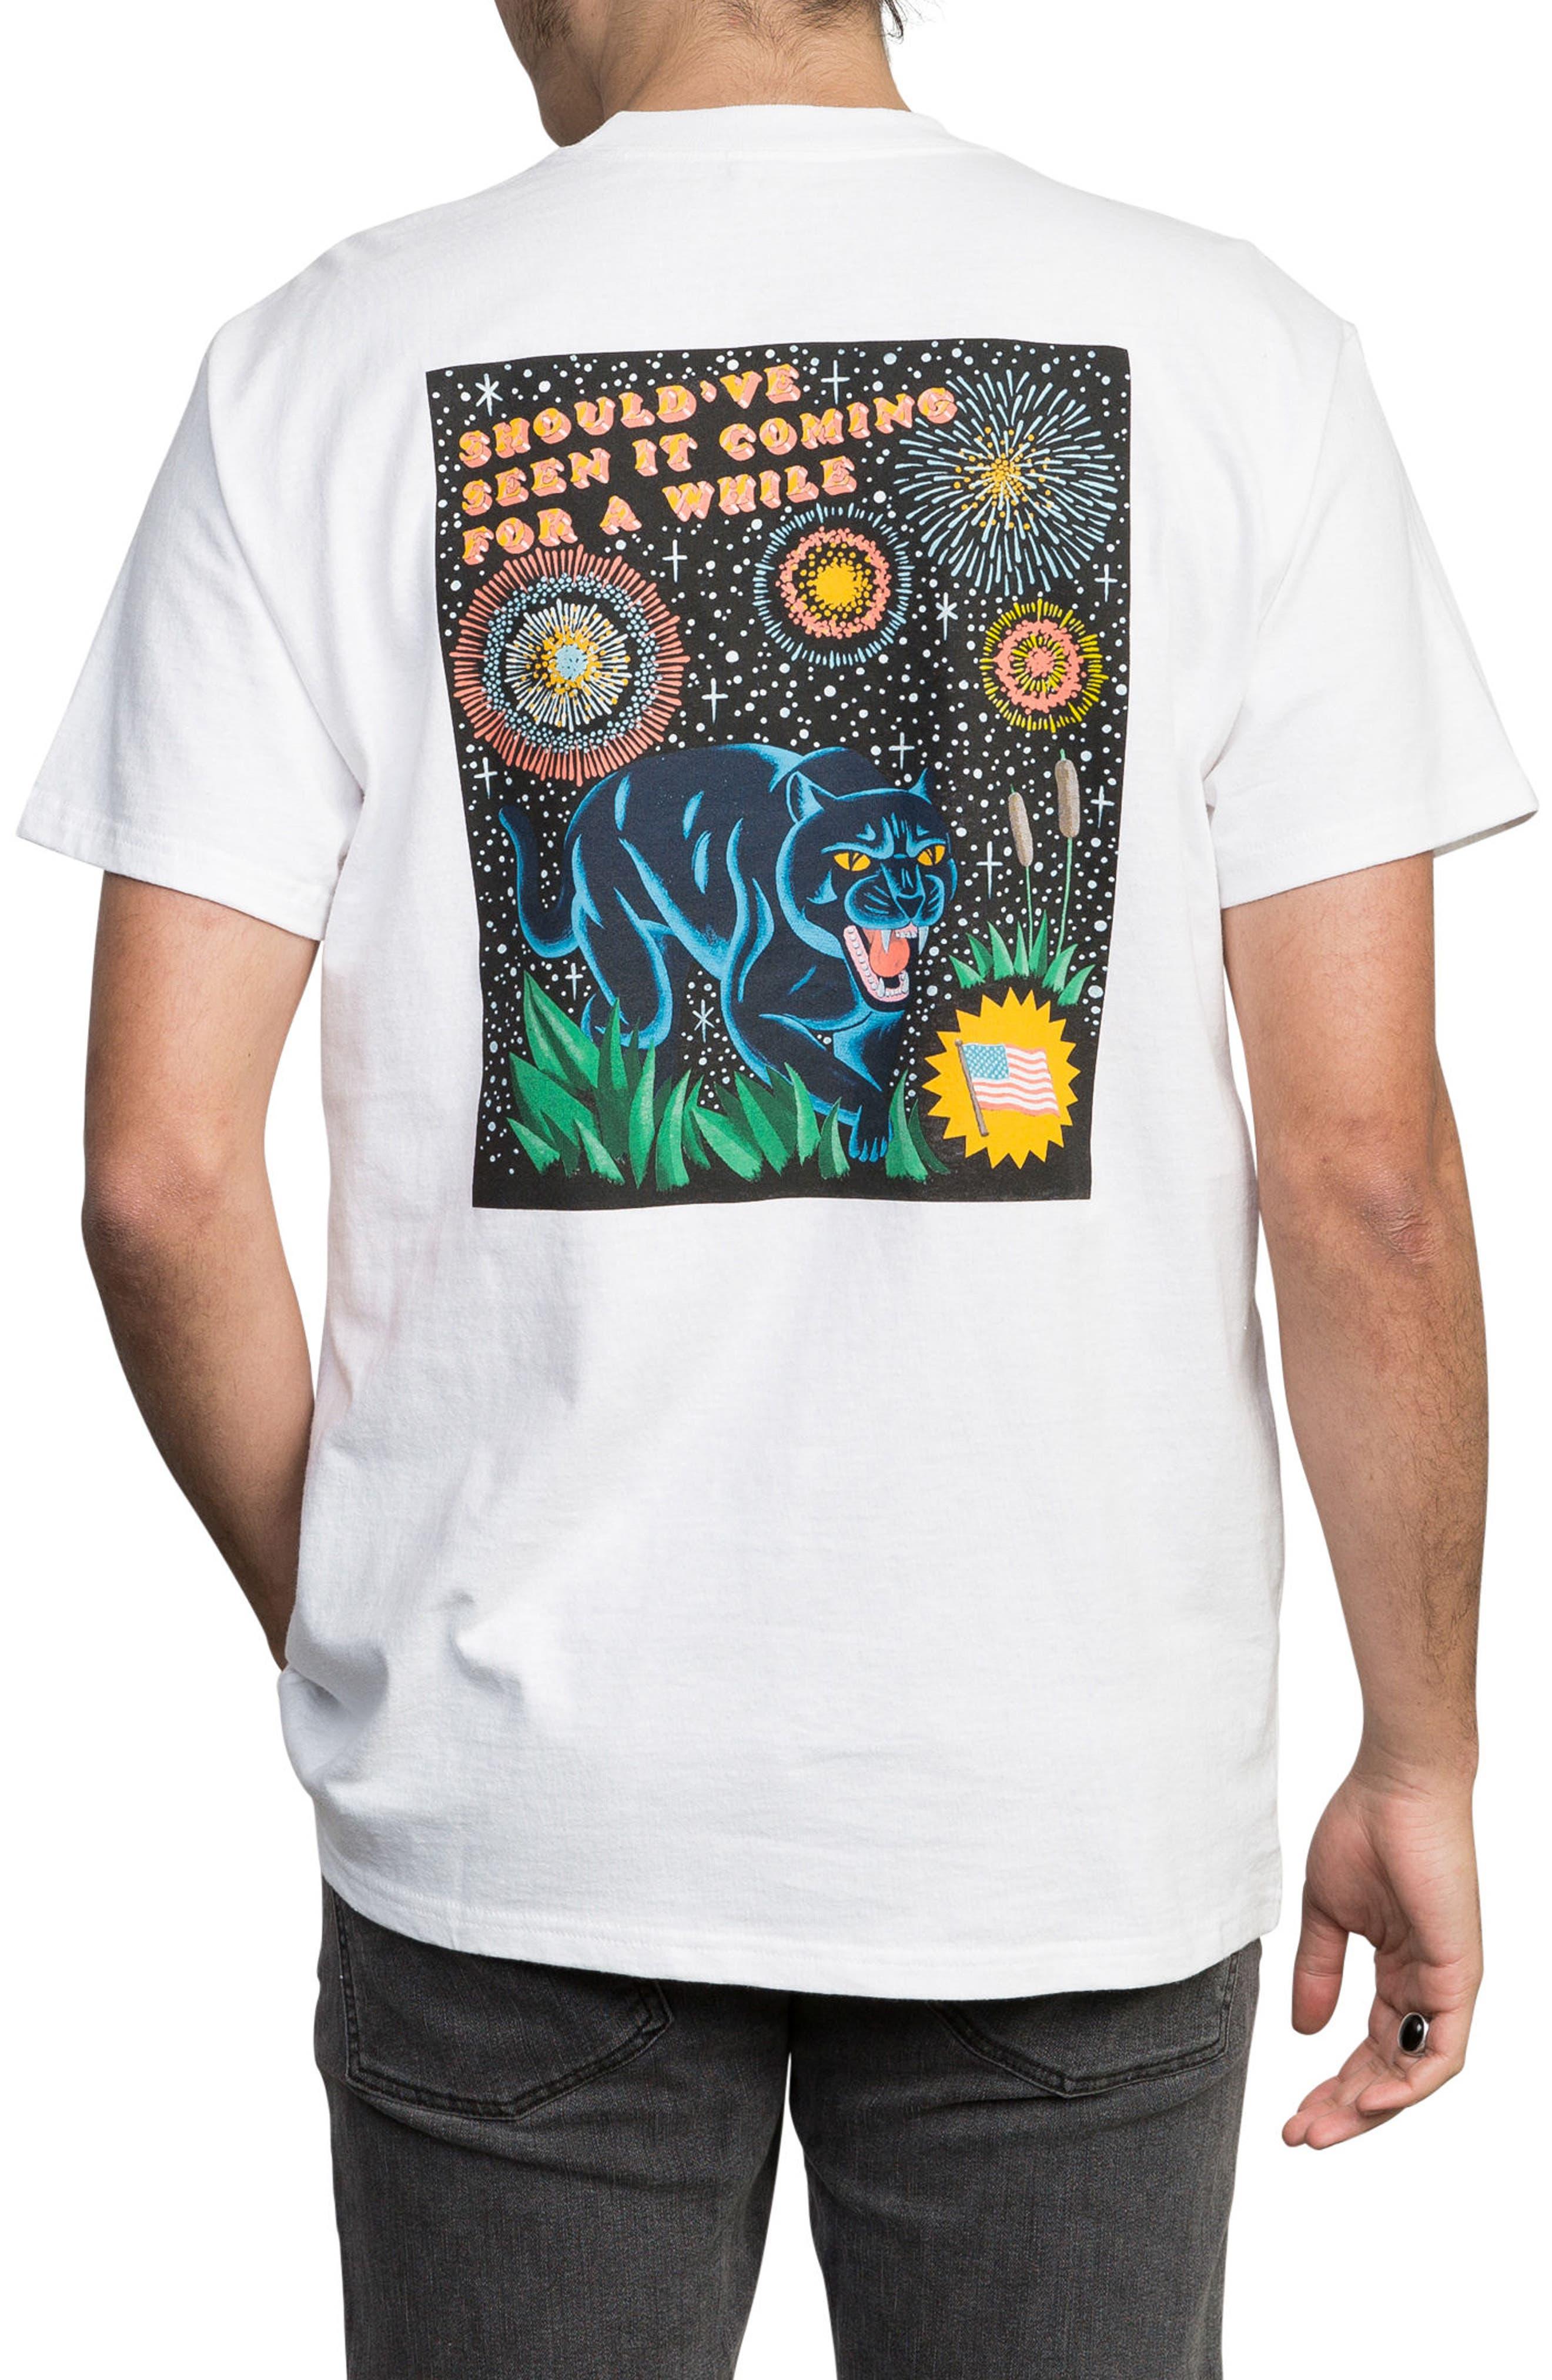 Luke Pelletier Blue Panther T-Shirt,                             Alternate thumbnail 2, color,                             White